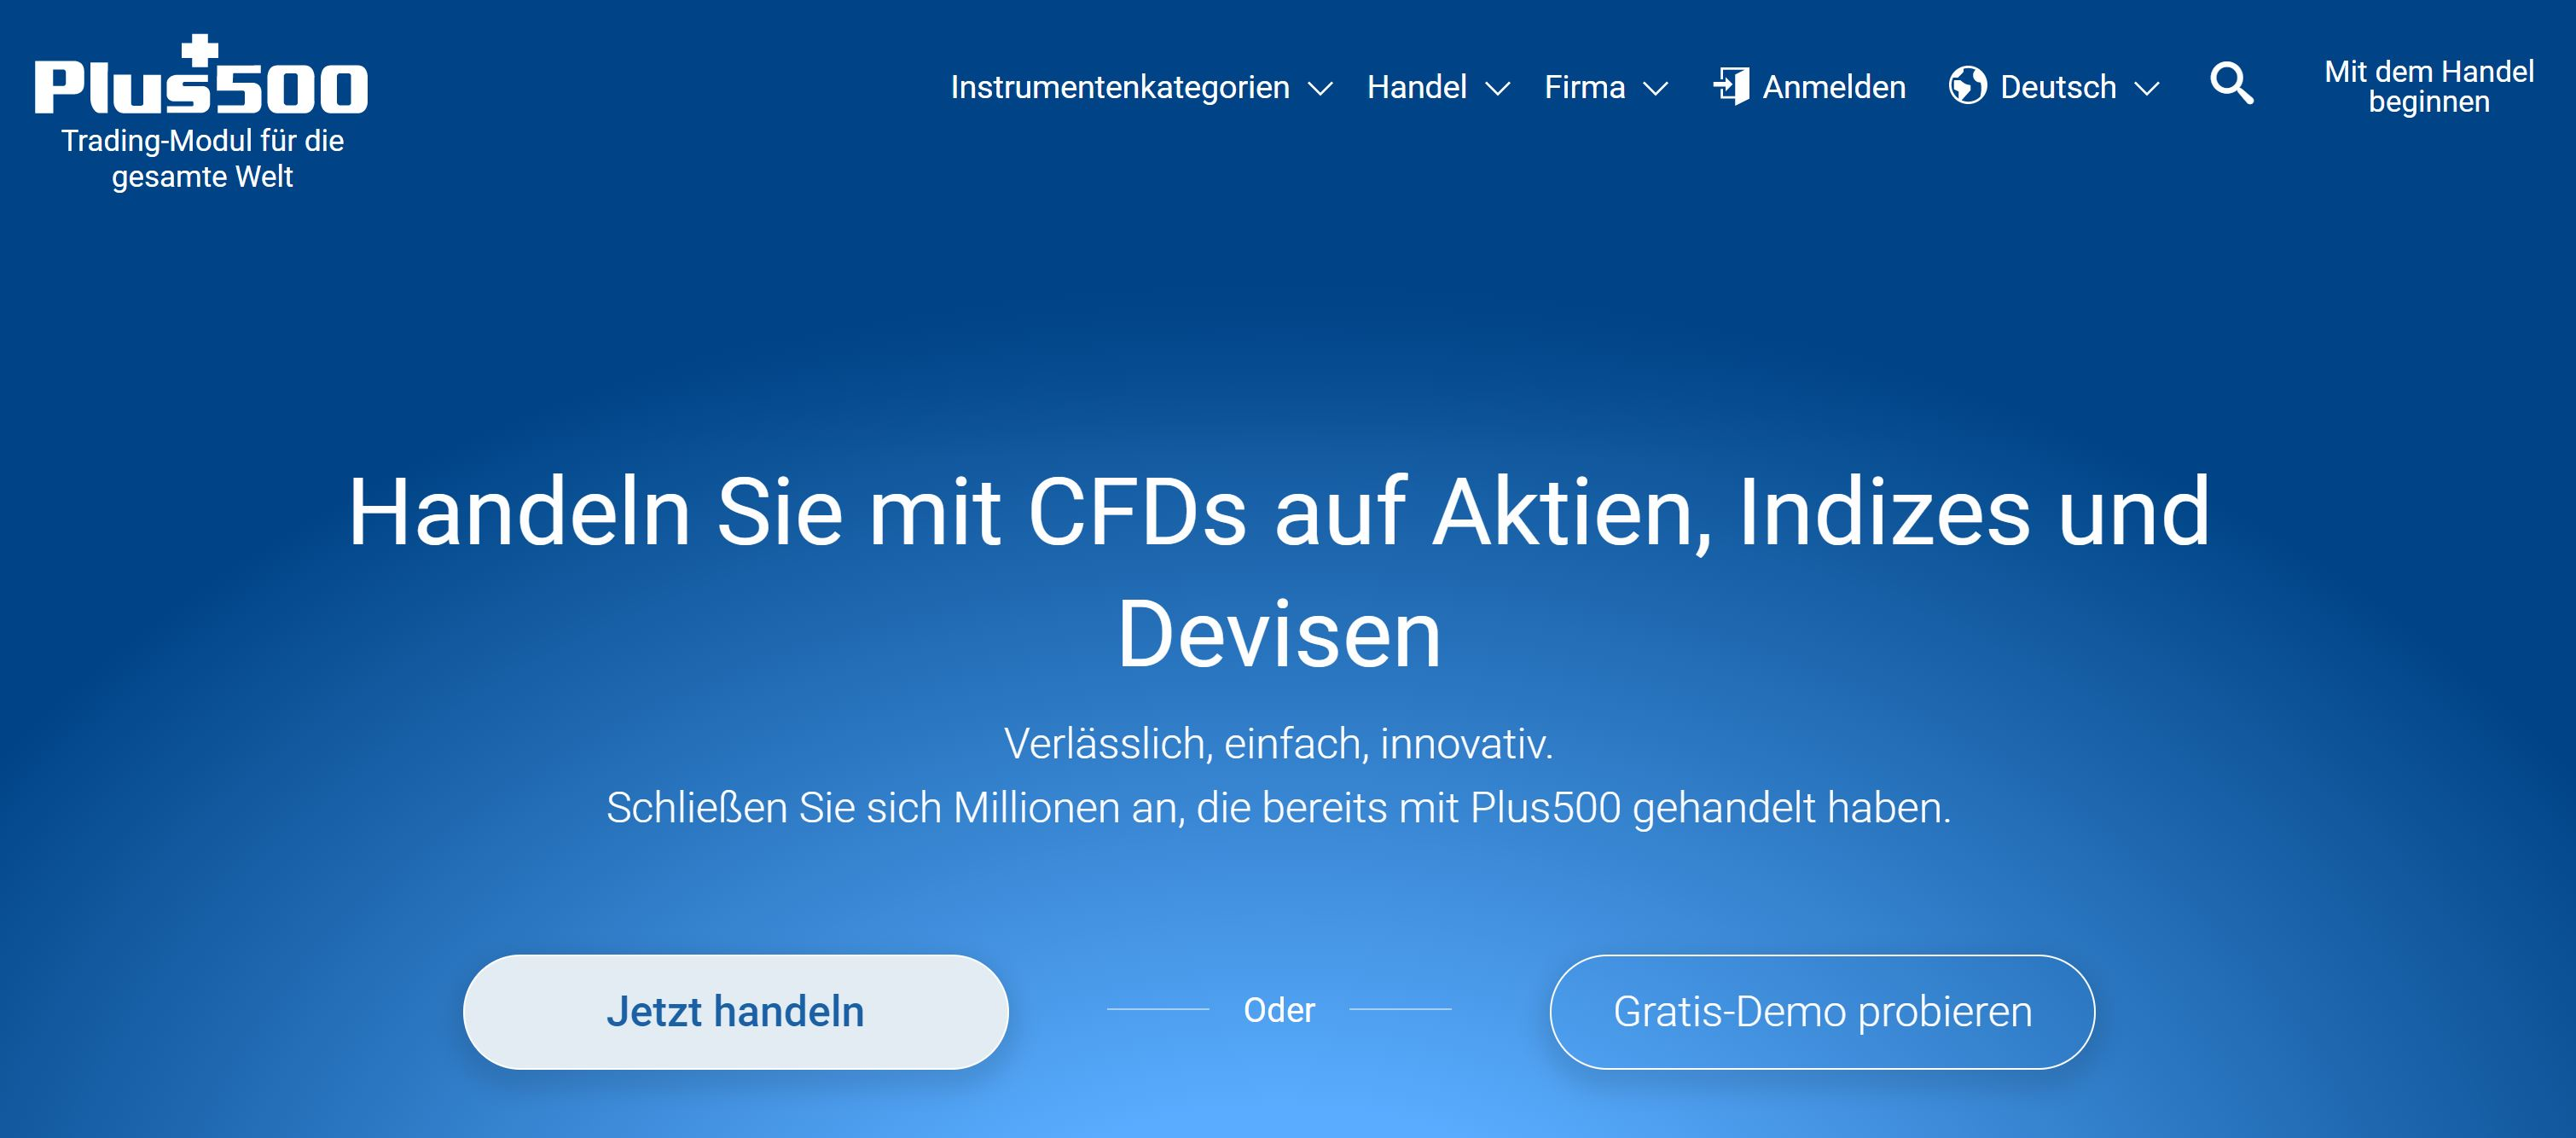 Plus500 website and logo